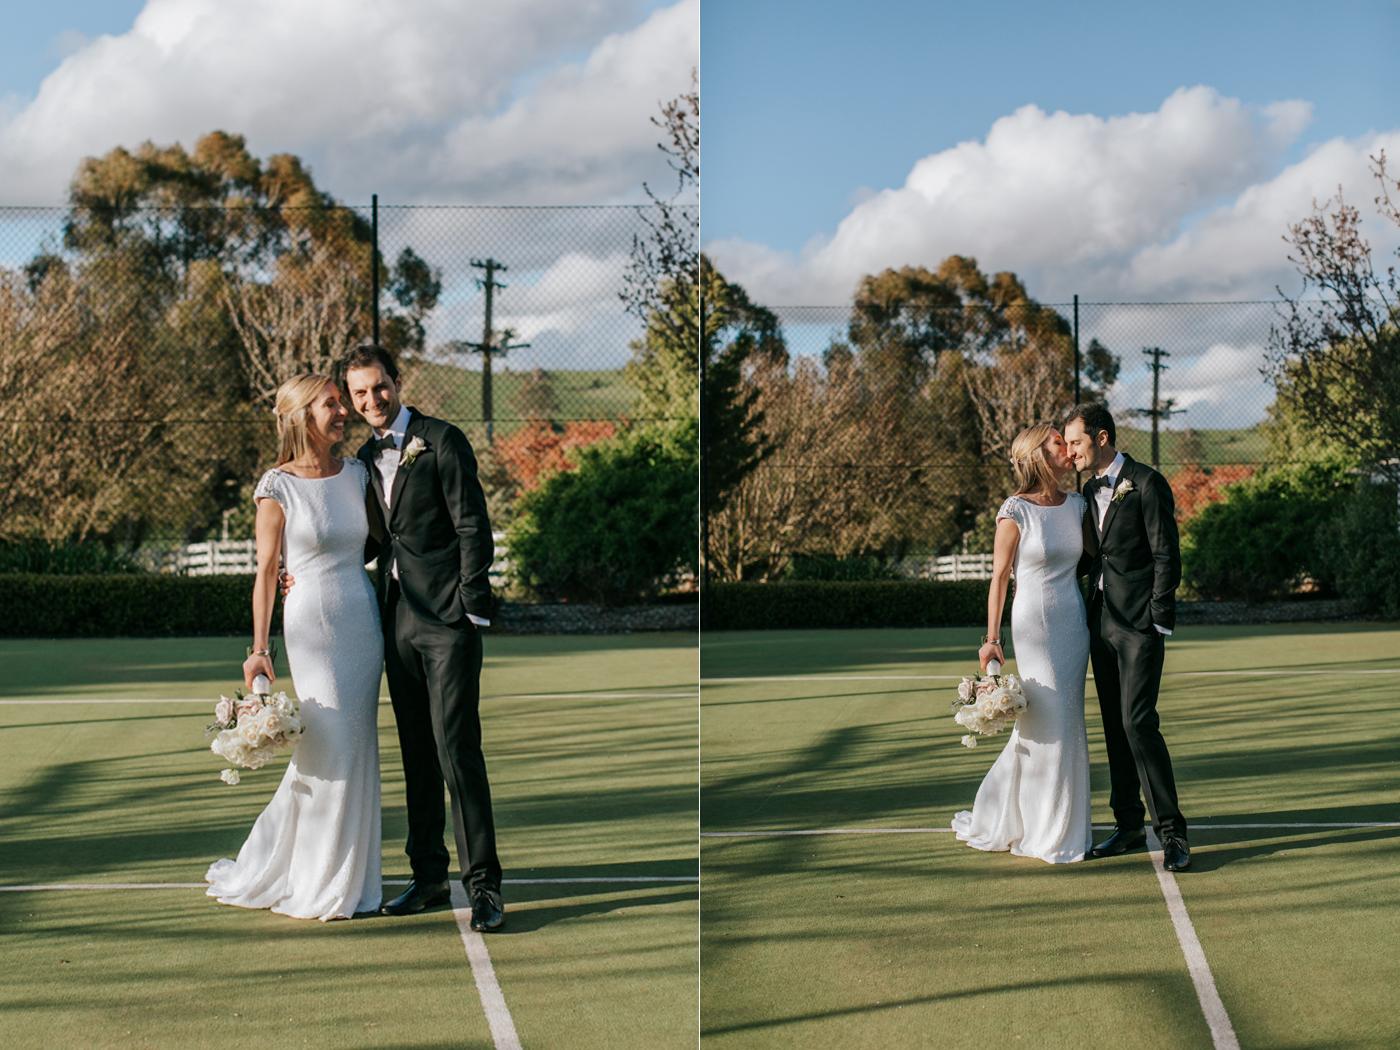 Bridget & James - Orange Country Wedding - Samantha Heather Photography-131.jpg